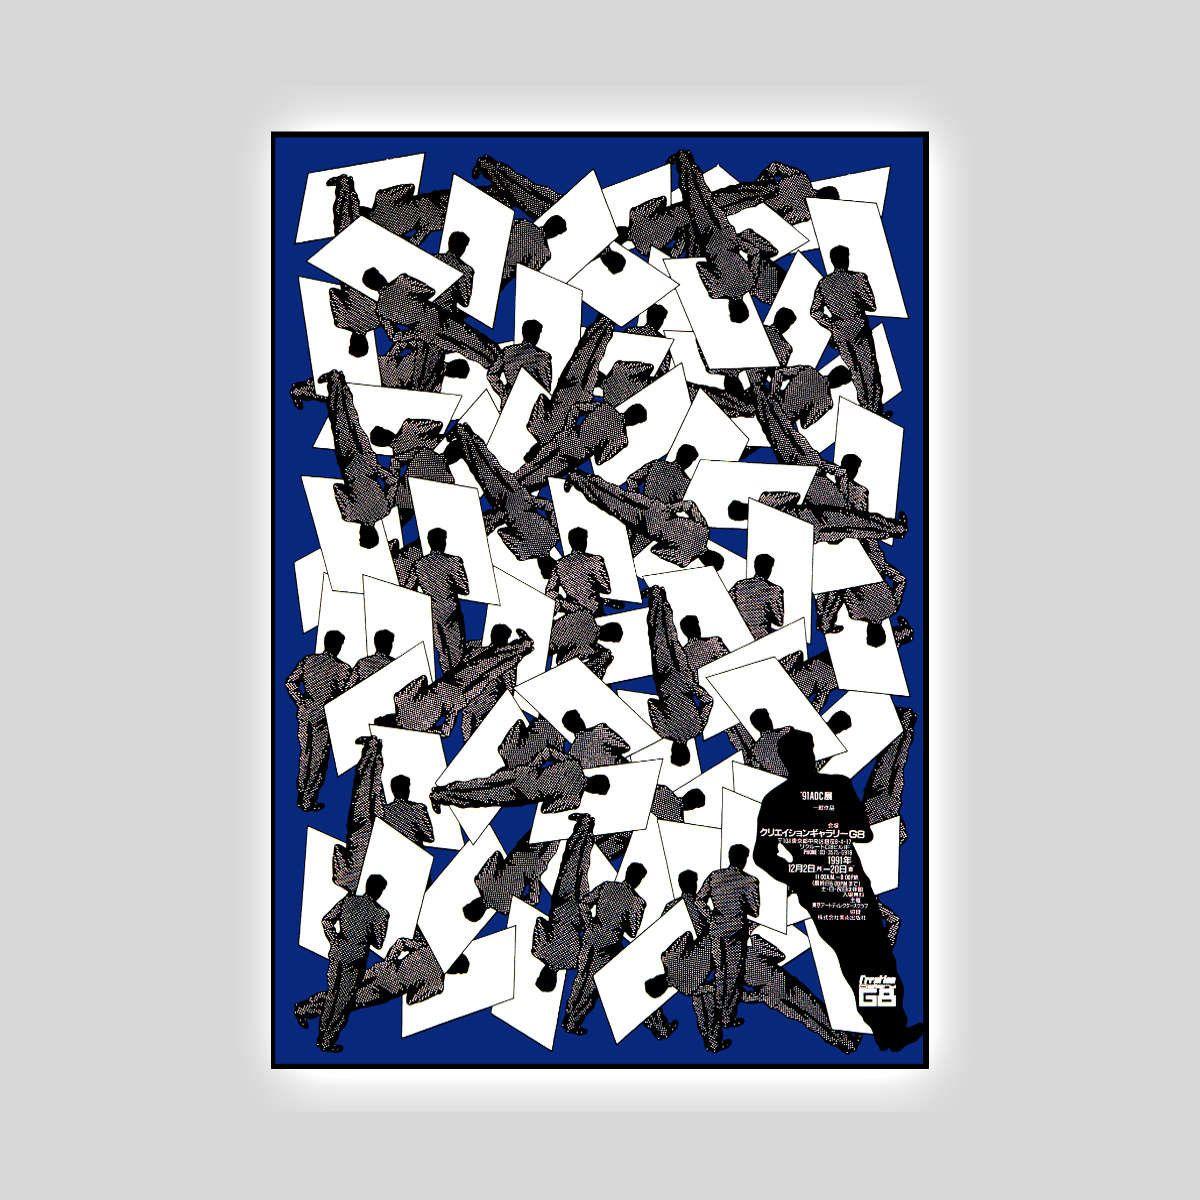 ADC Exhibition Poster by Shigeo Fukuda 1991 Digitally